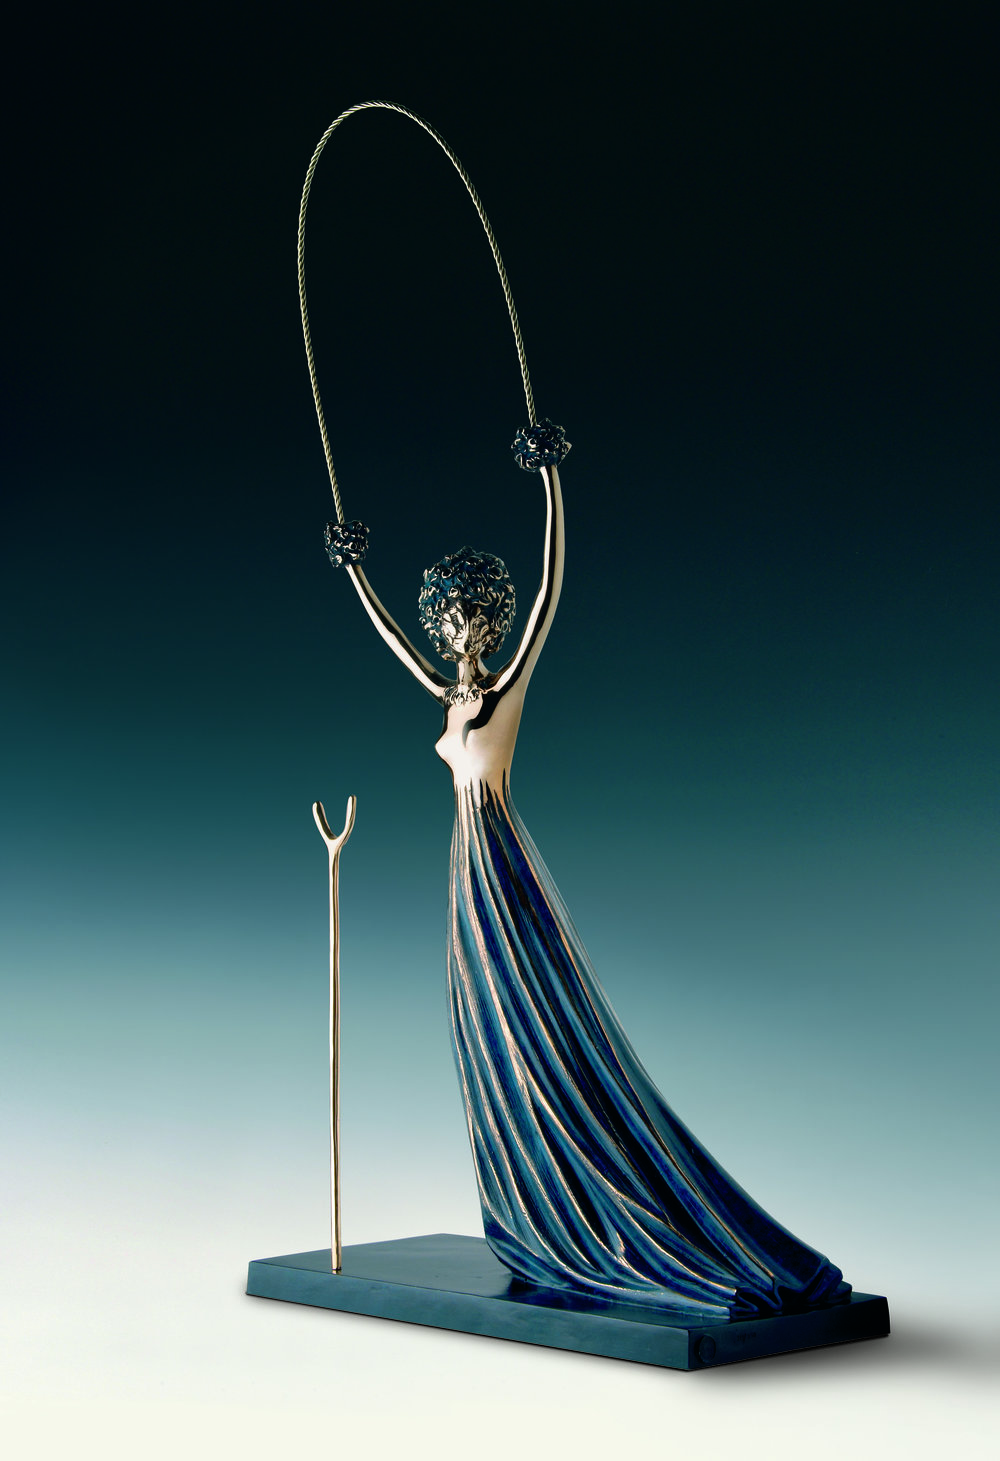 Alice in Wonderland , 1977-1984 Bronze 35 80/127h x 17 91/127w x 7 111/127d in  ©IAR Art Resources